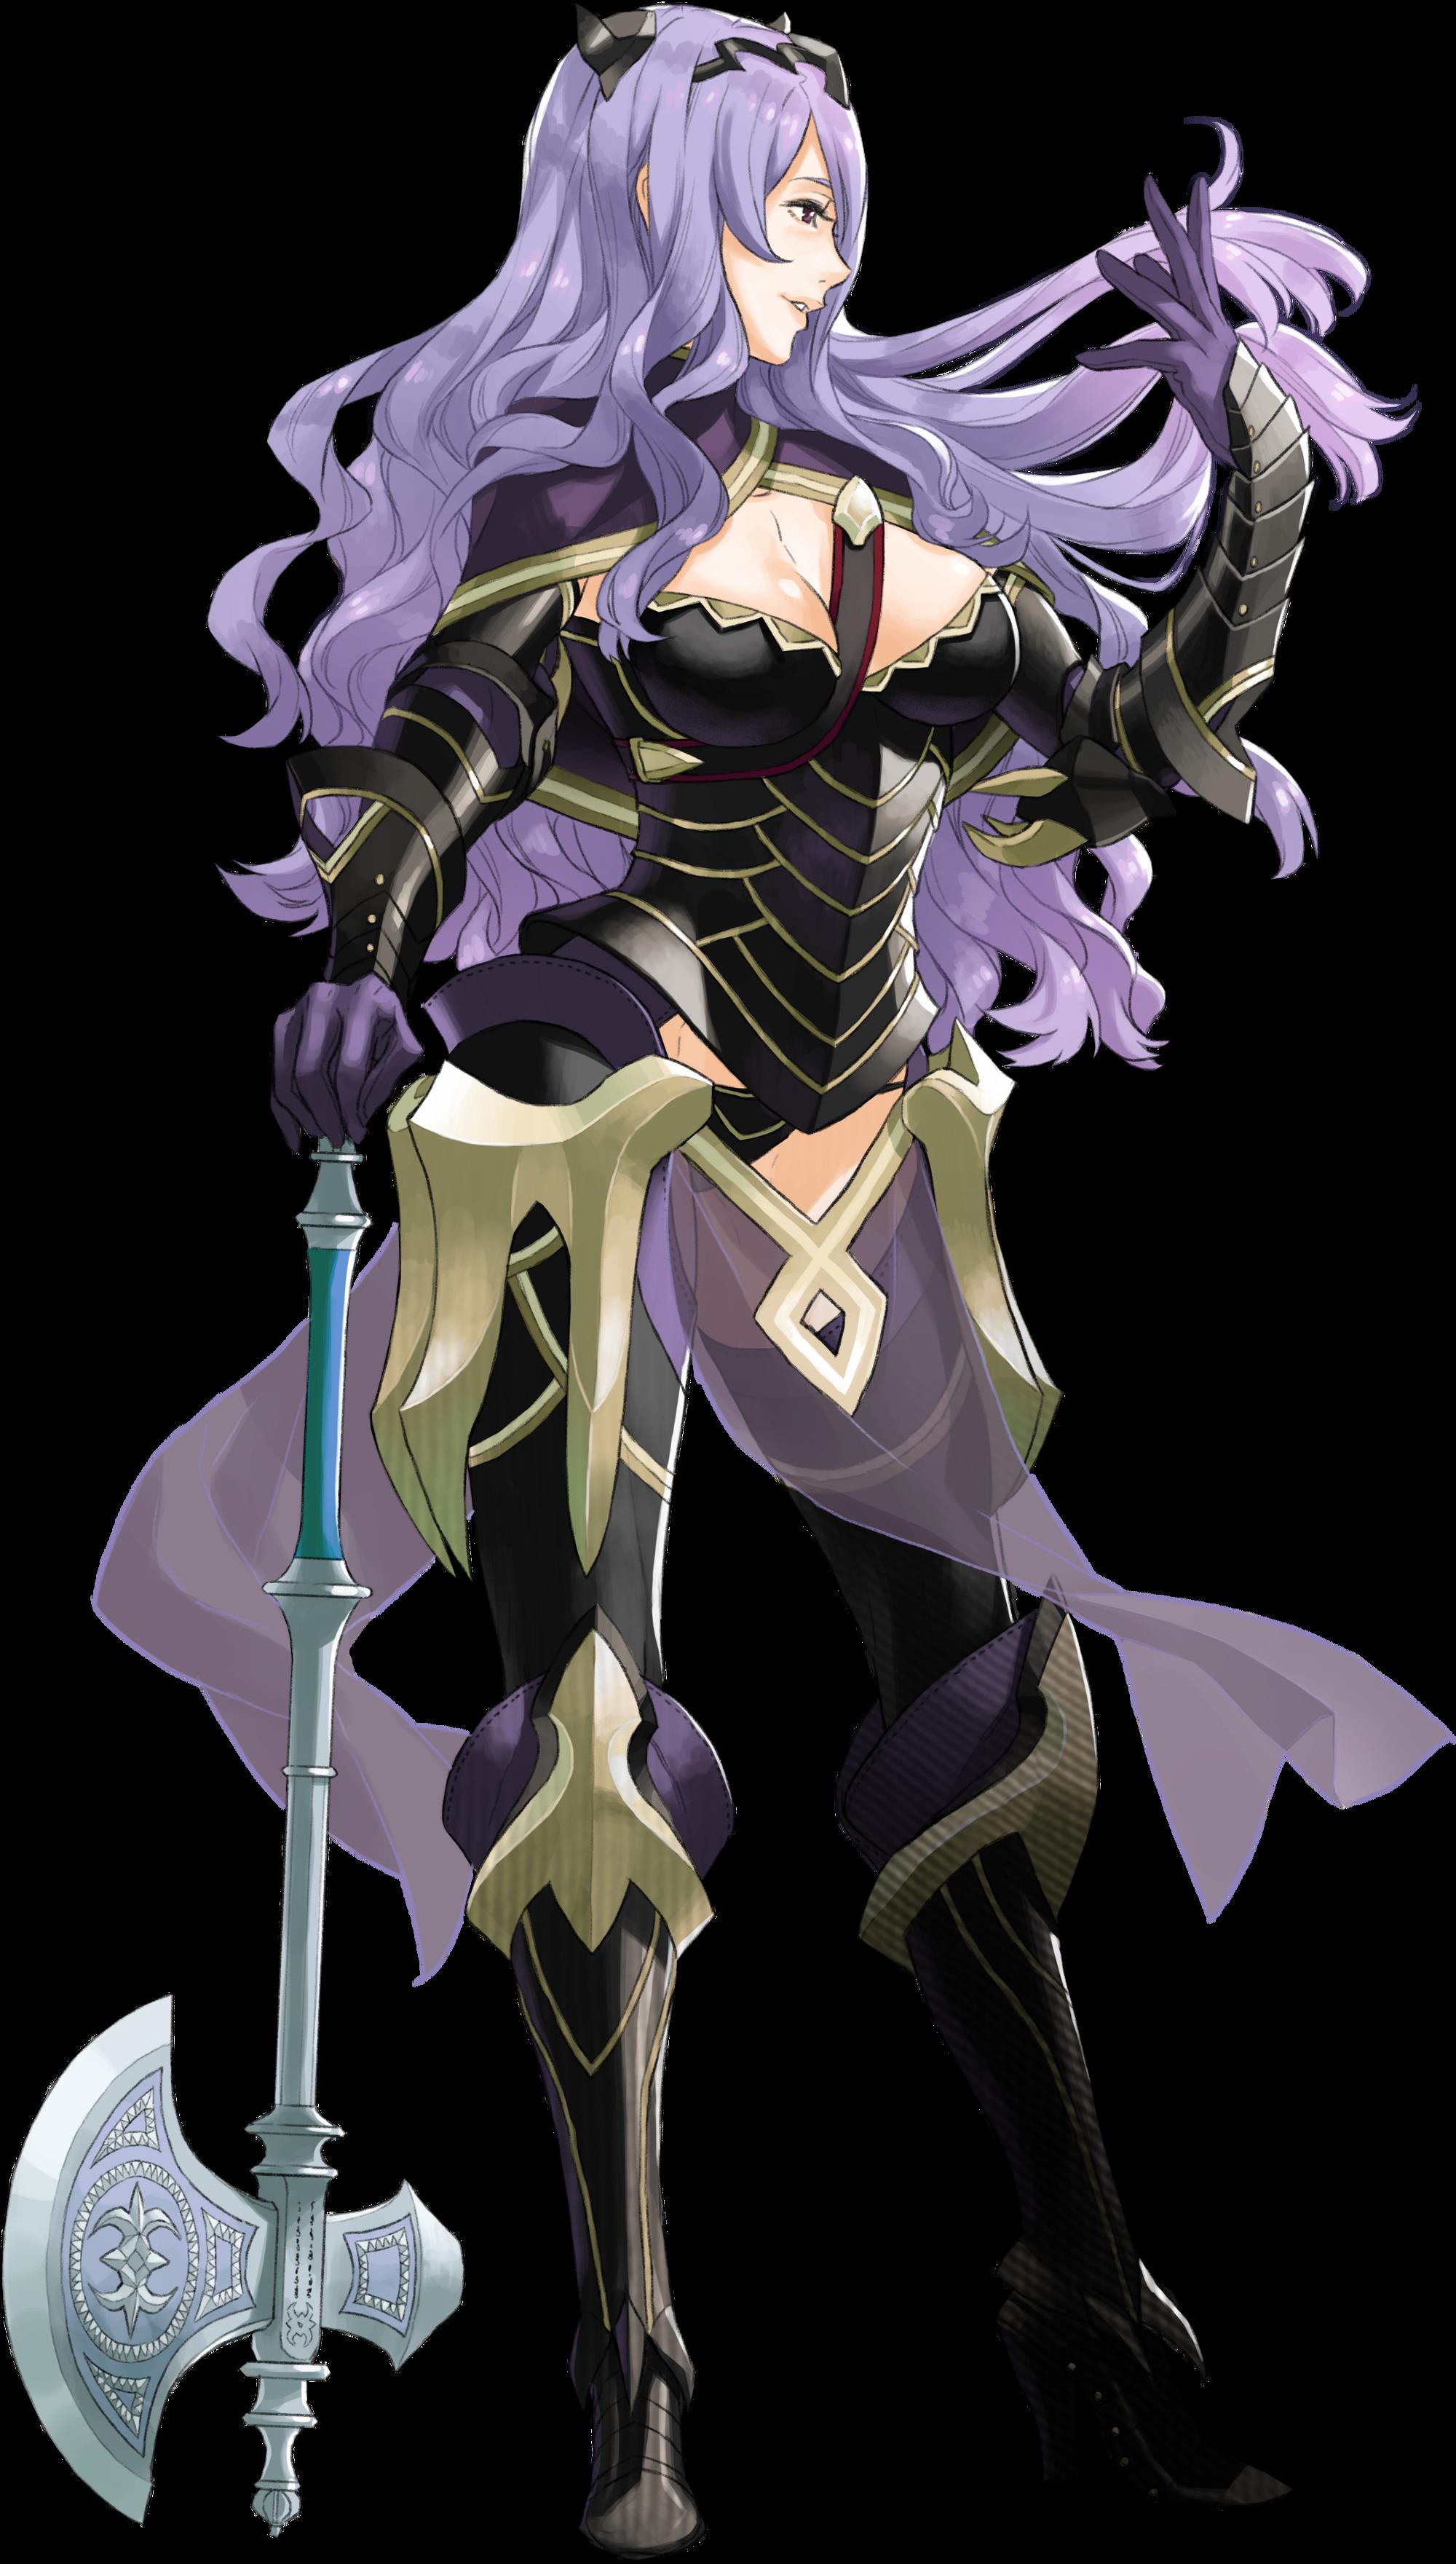 Image azura birthright cutscene fire emblem wiki